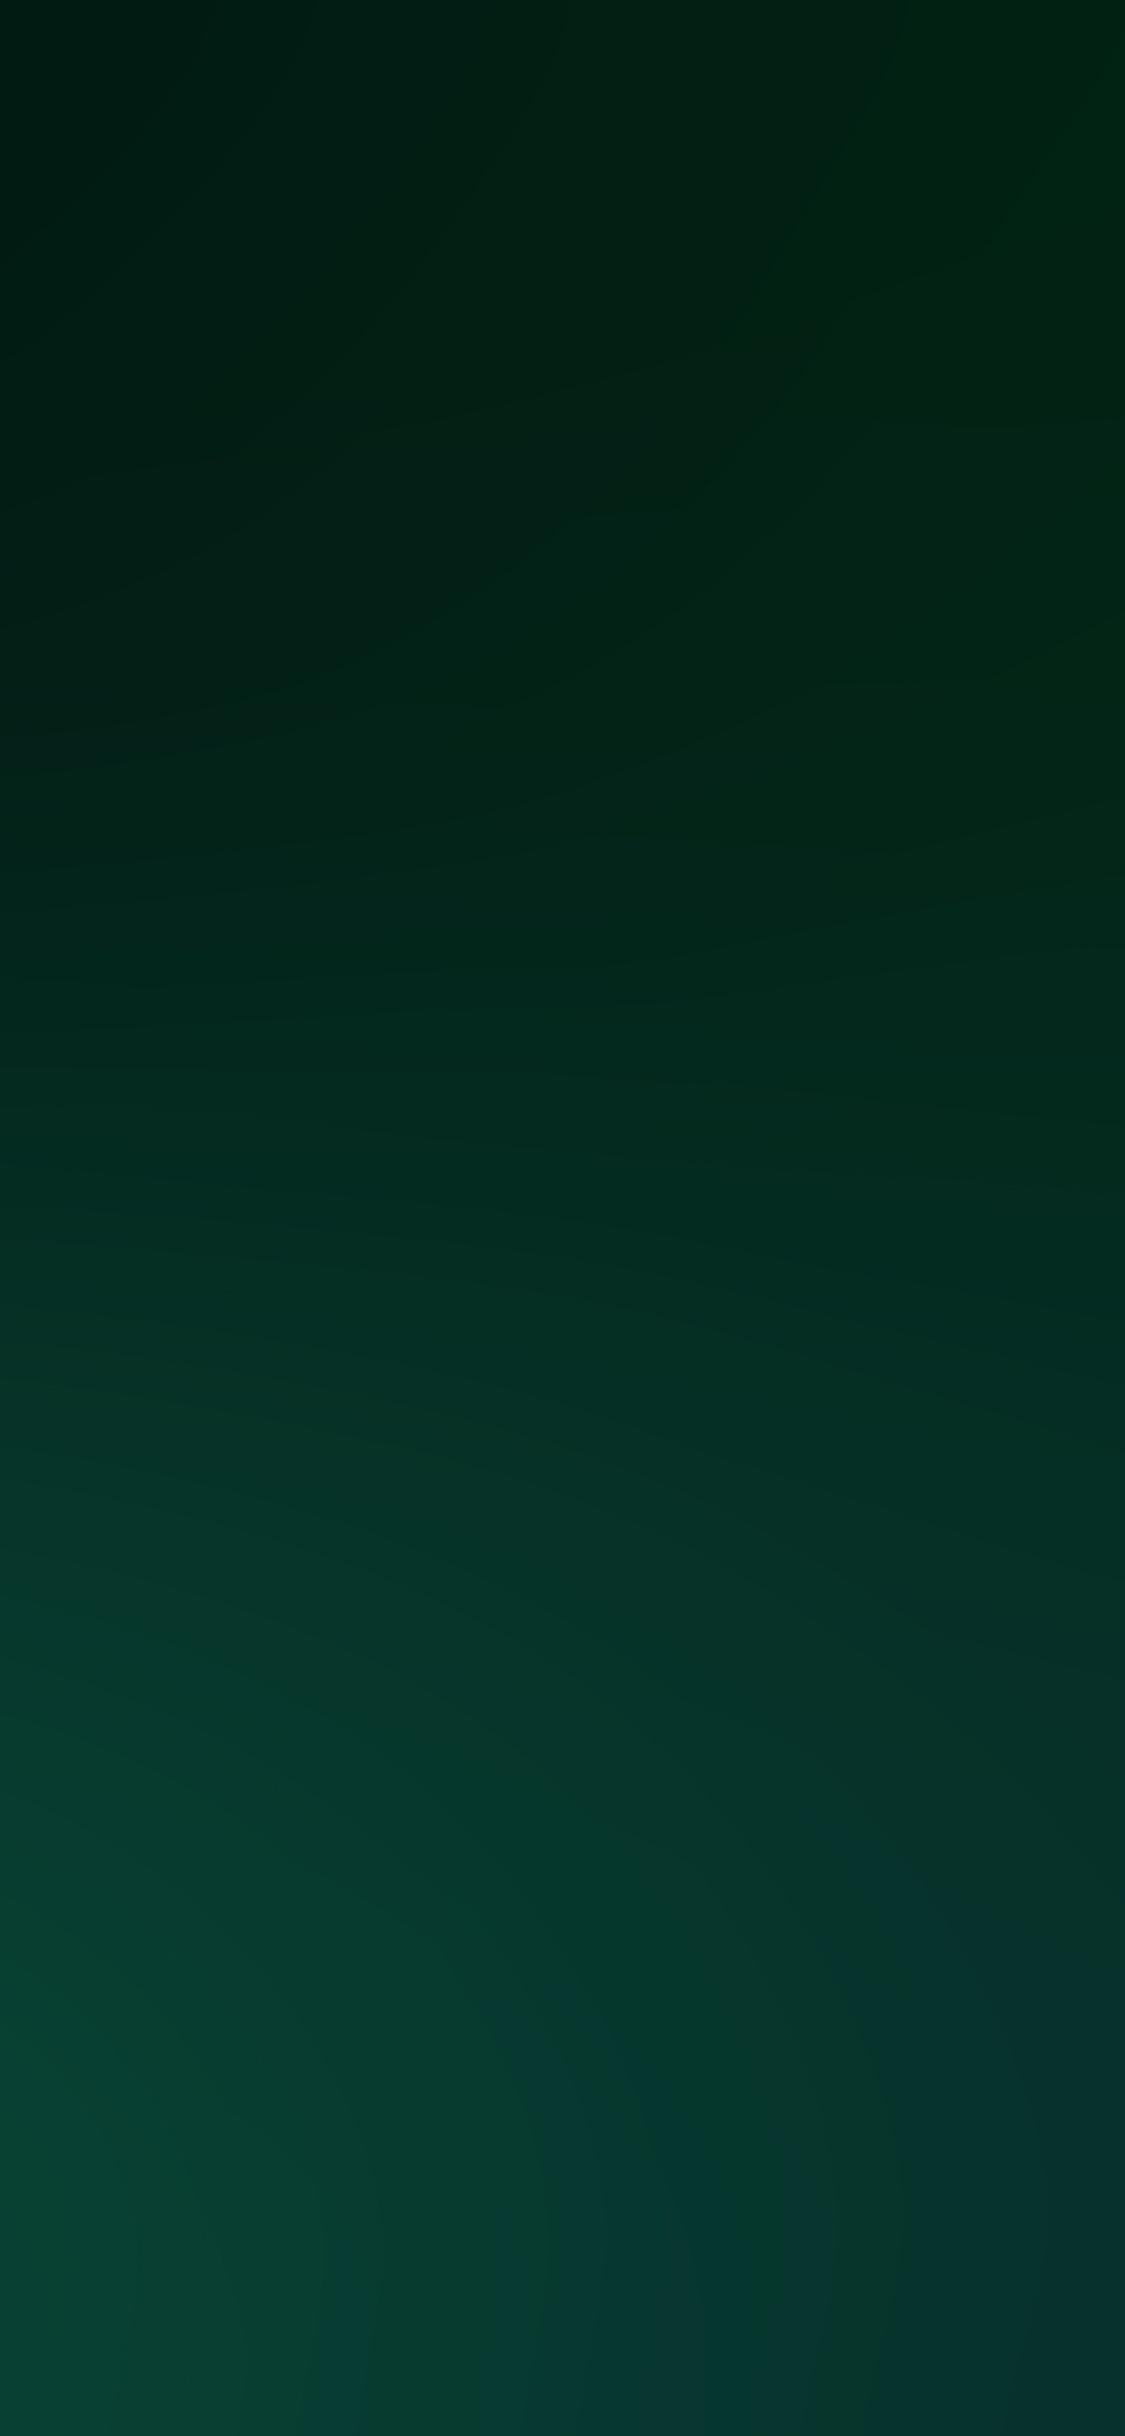 iPhoneXpapers.com-Apple-iPhone-wallpaper-sk64-dark-green-blur-gradation